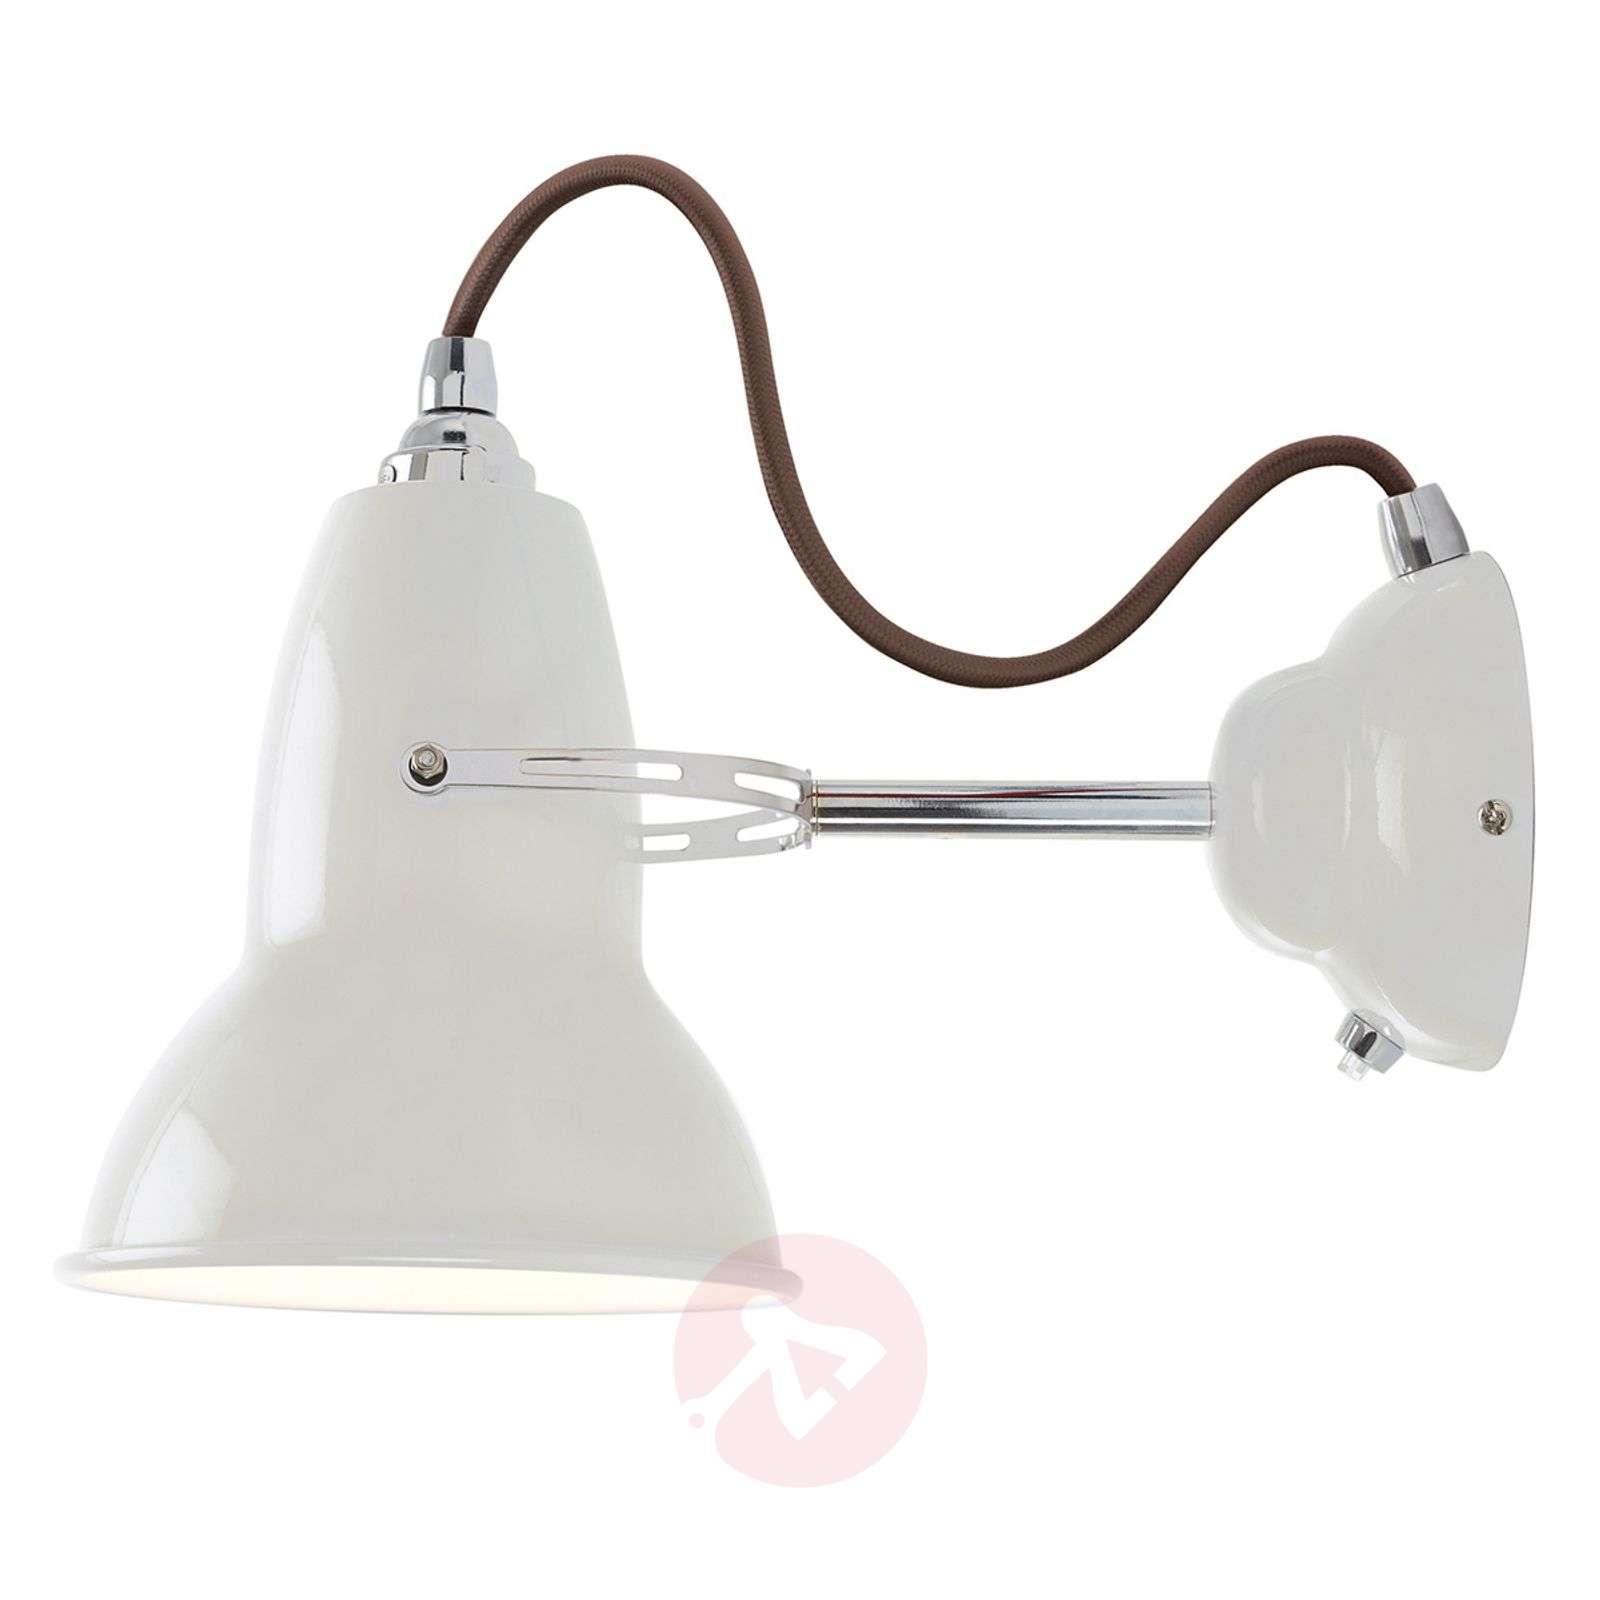 Anglepoise® Original 1227 wall lamp-1073093X-01